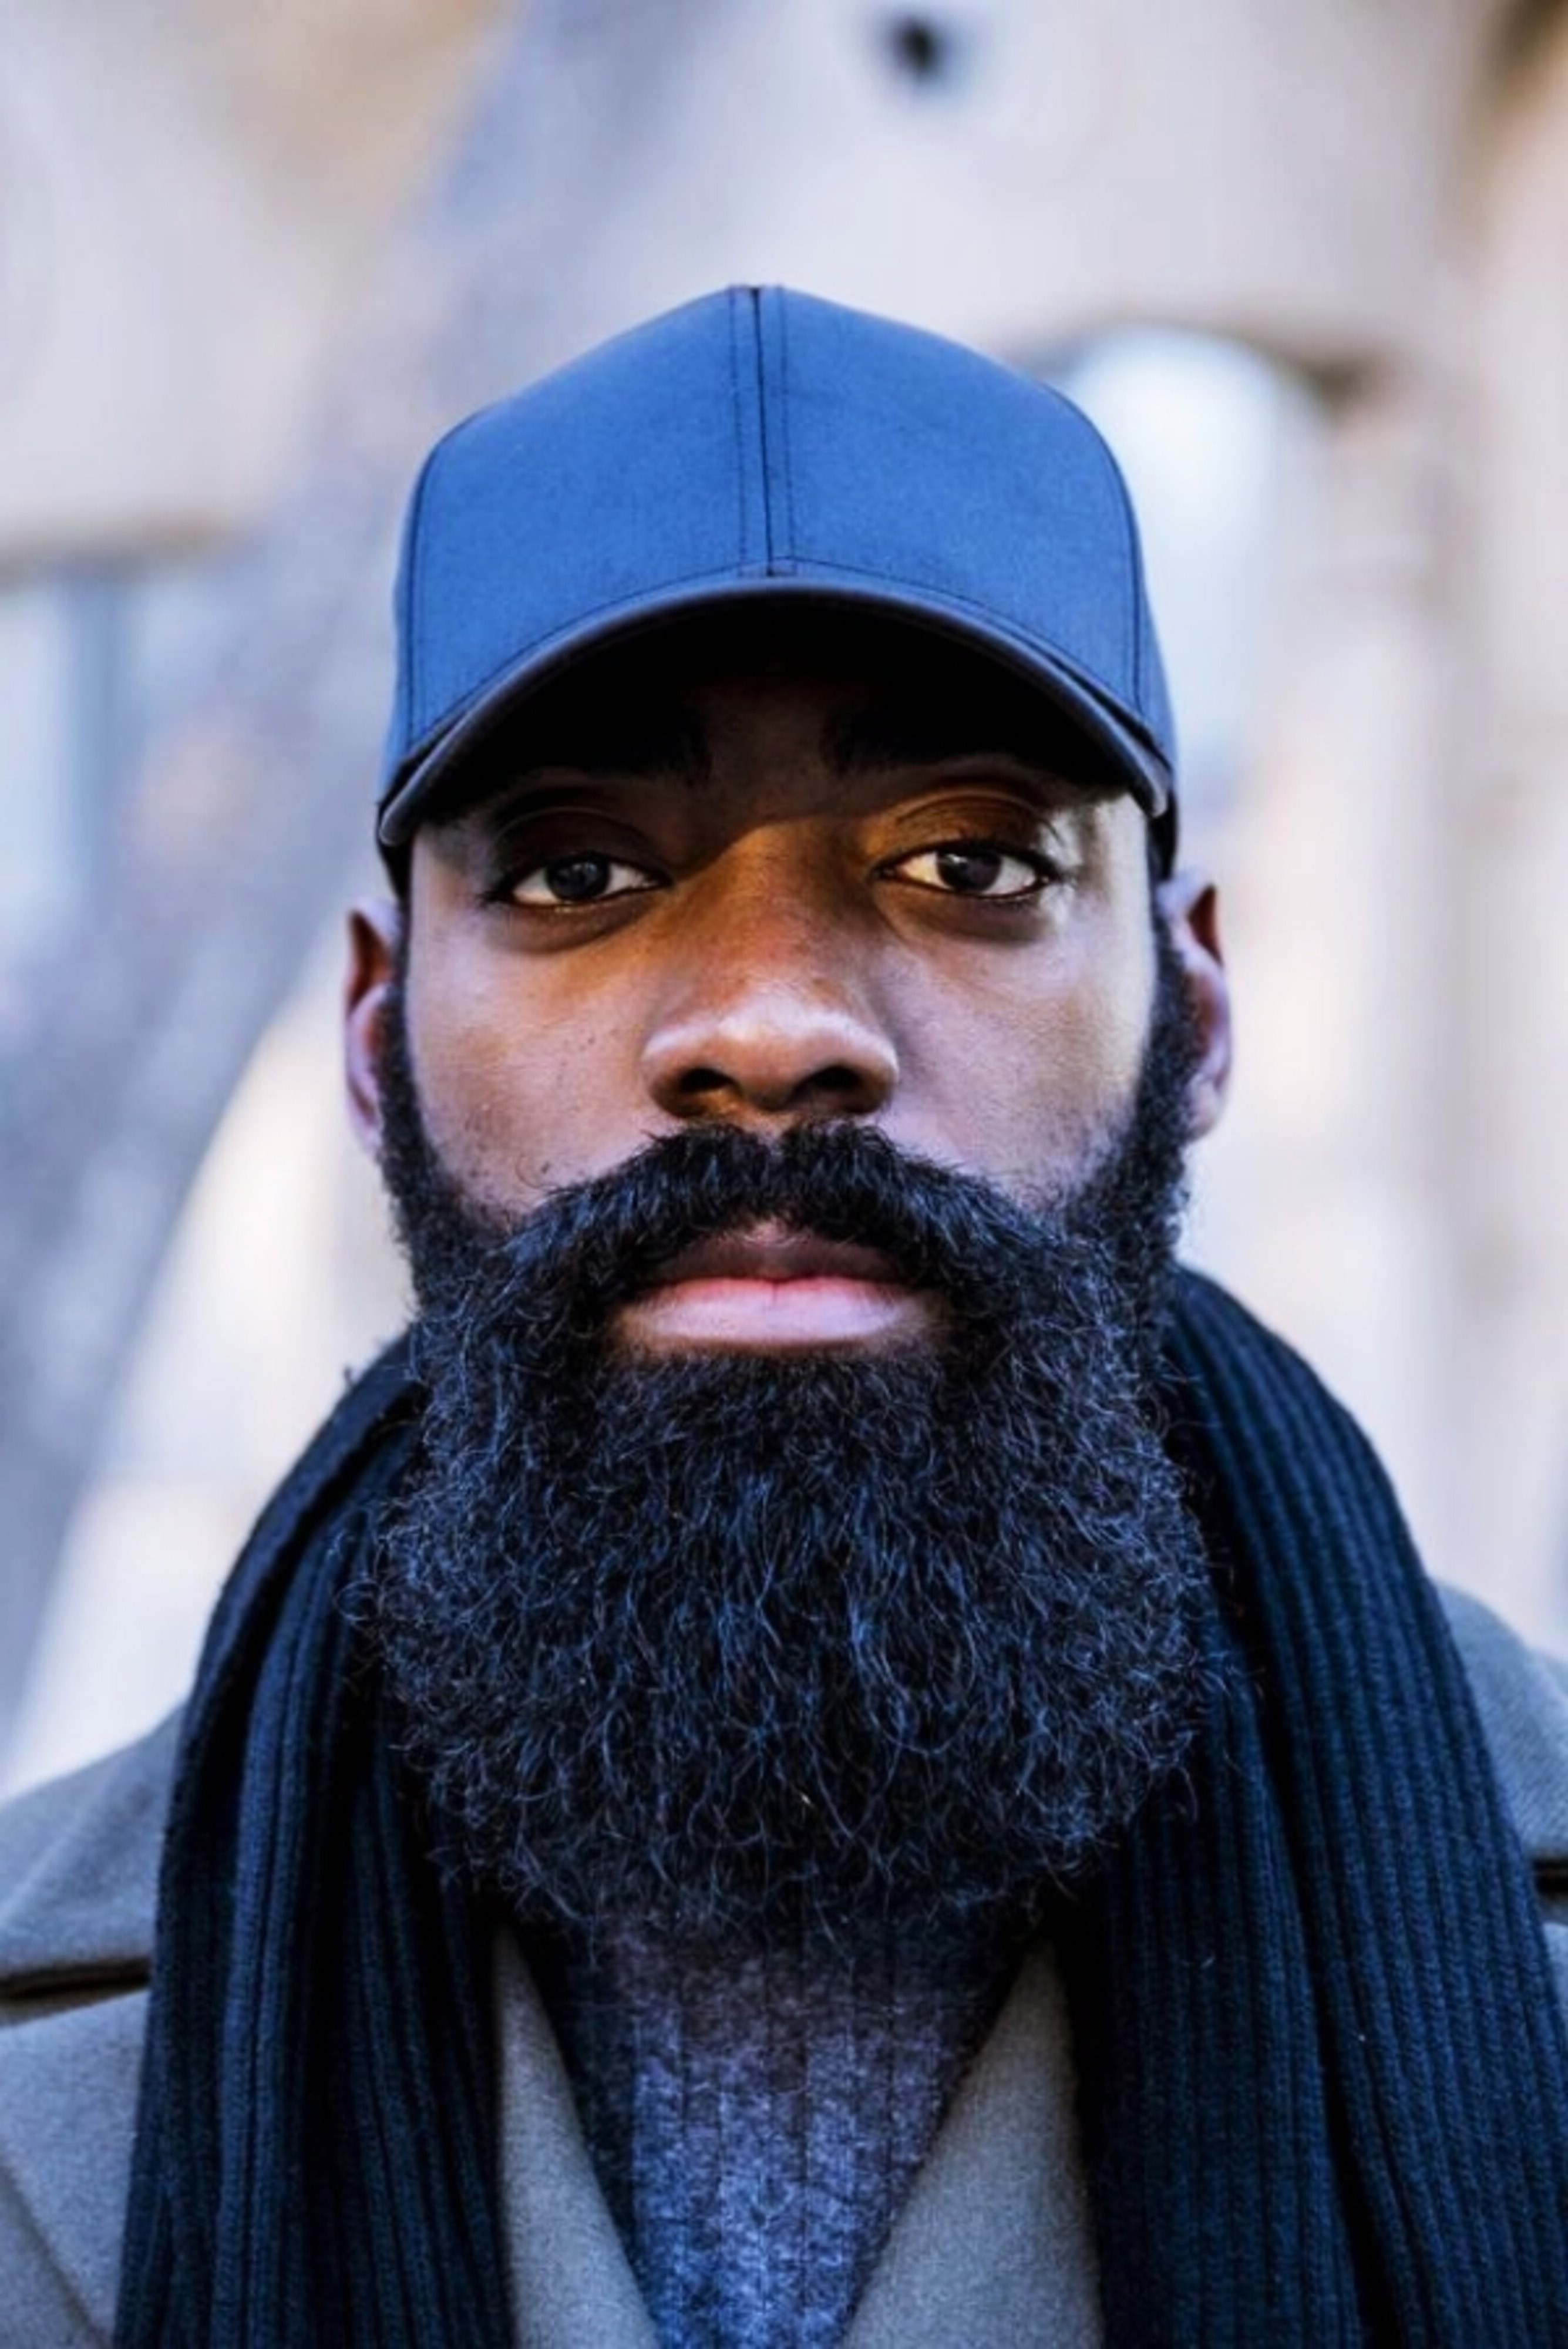 A Black Male with a Long Beard.